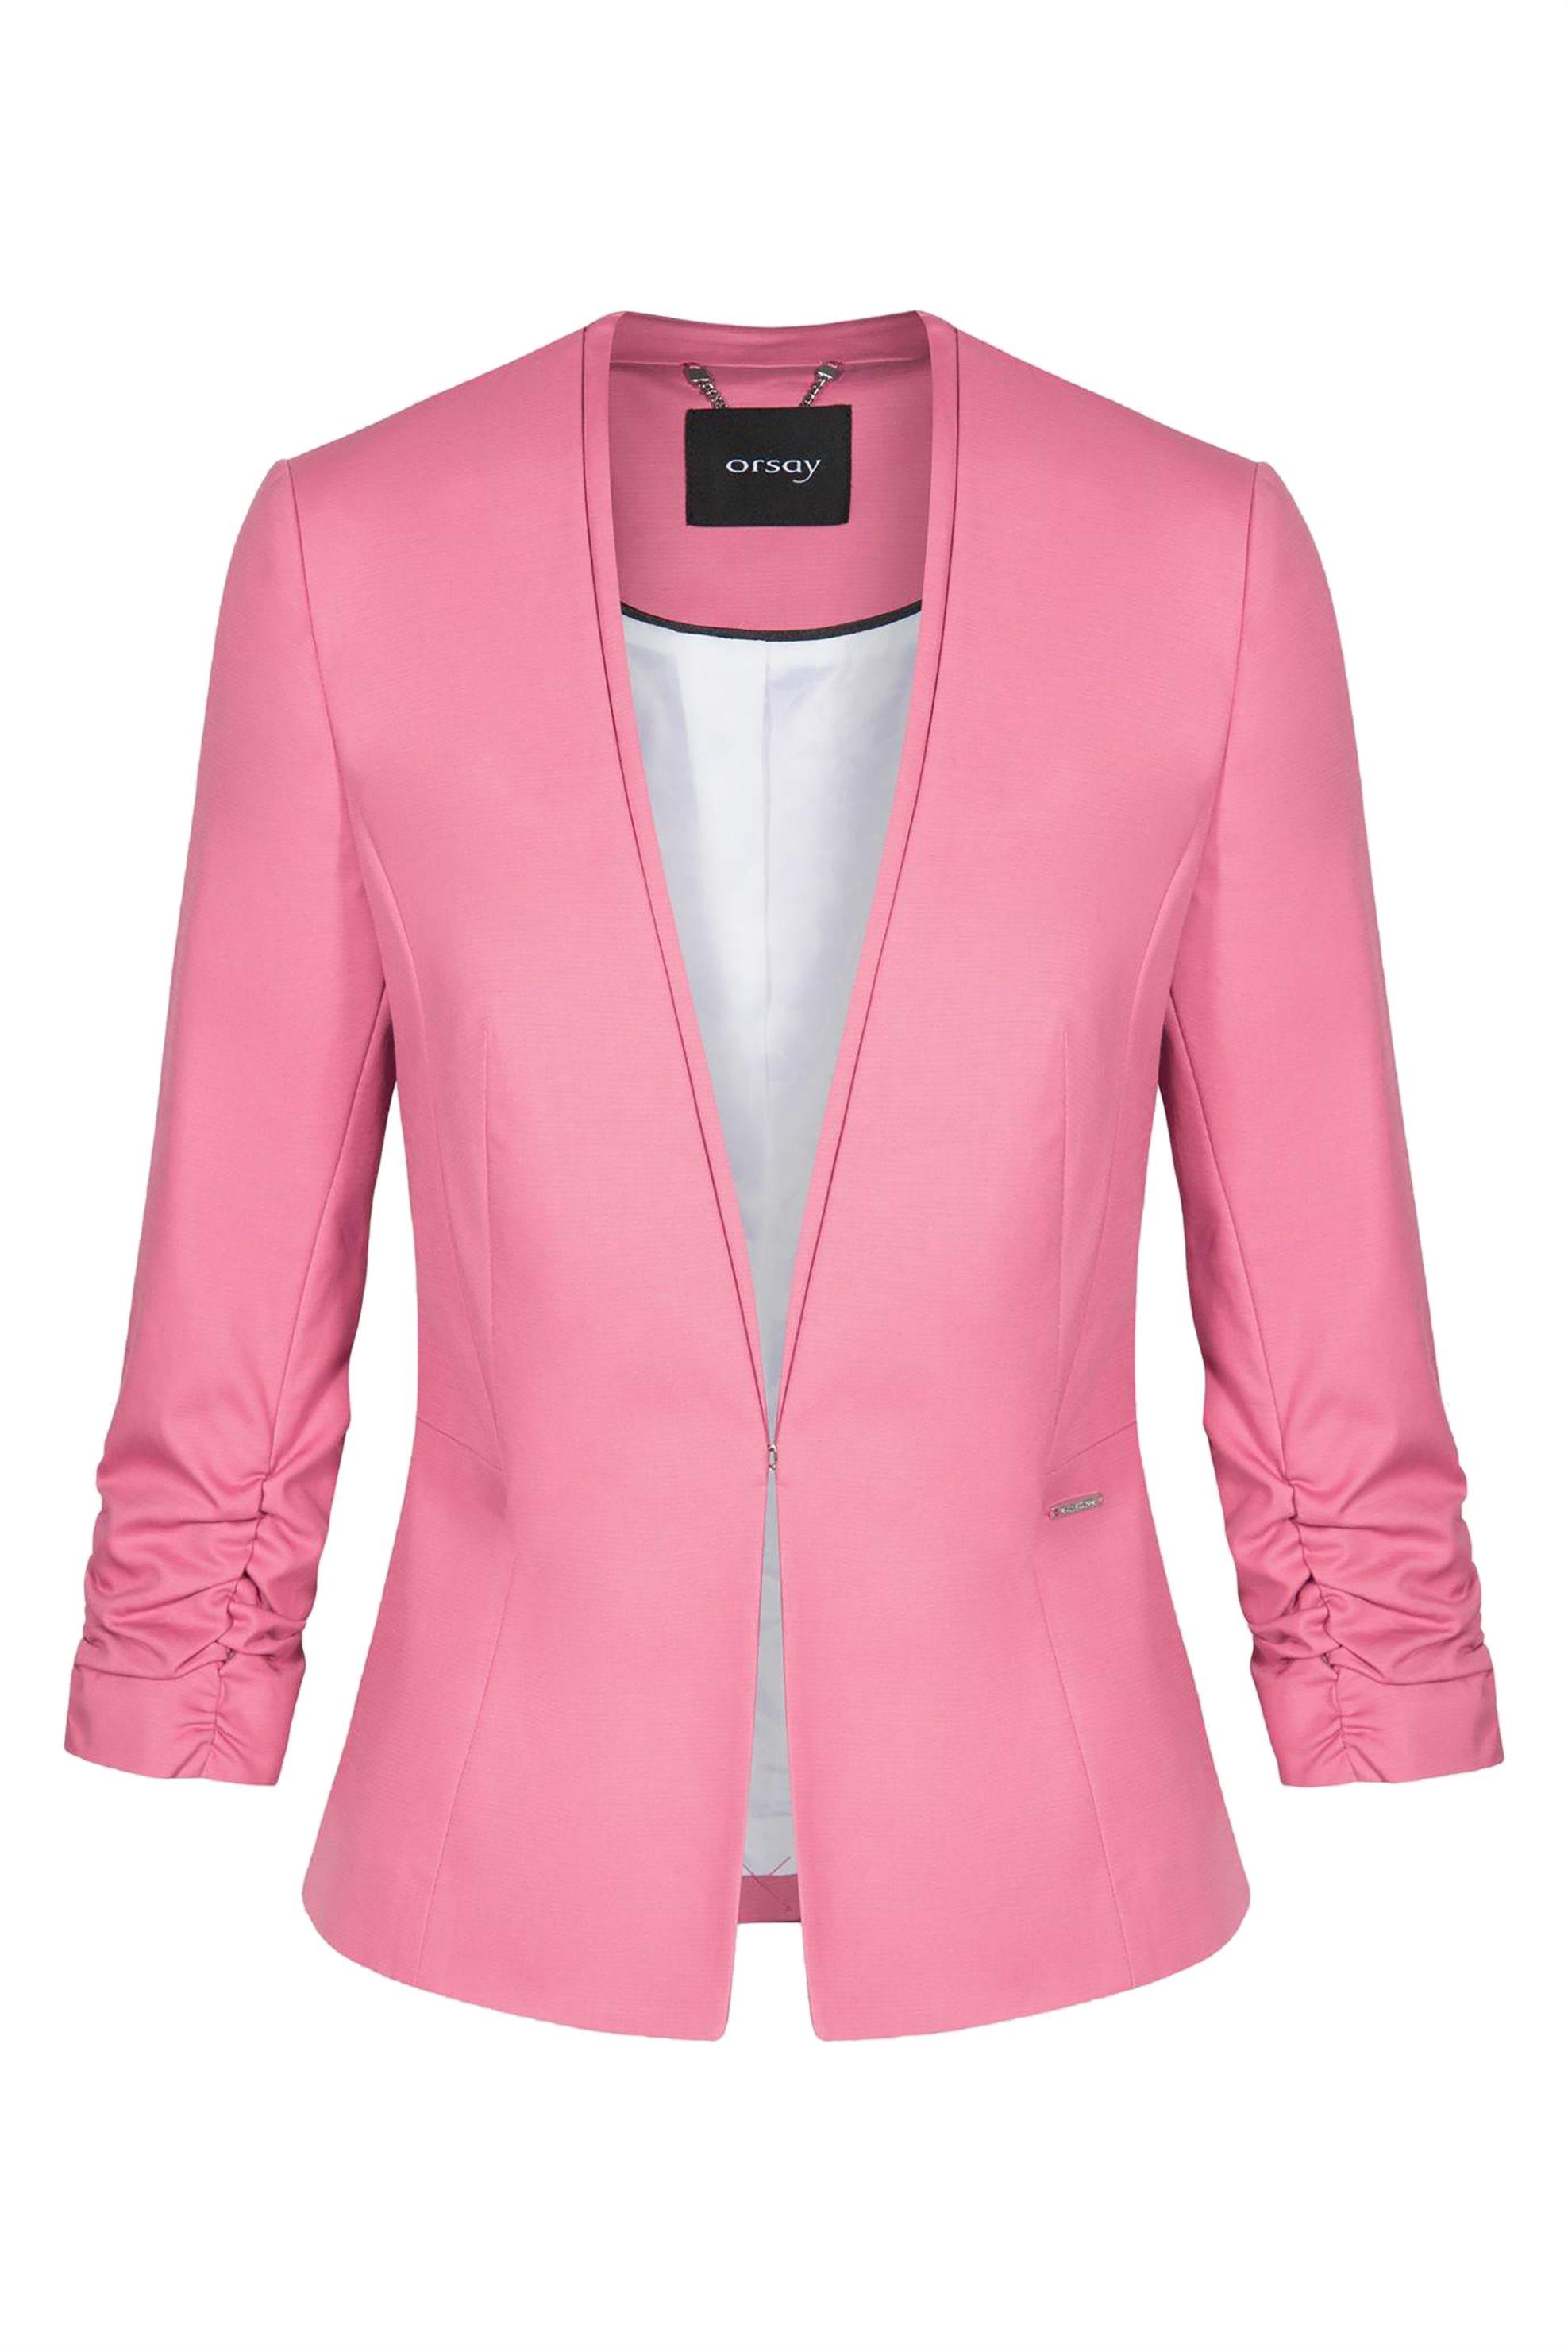 01028513a2e1 online αγορές Βαπτιστικό Σύνολο Σακάκι Μπλε γυναικα ρουχα πανωφόρια ...